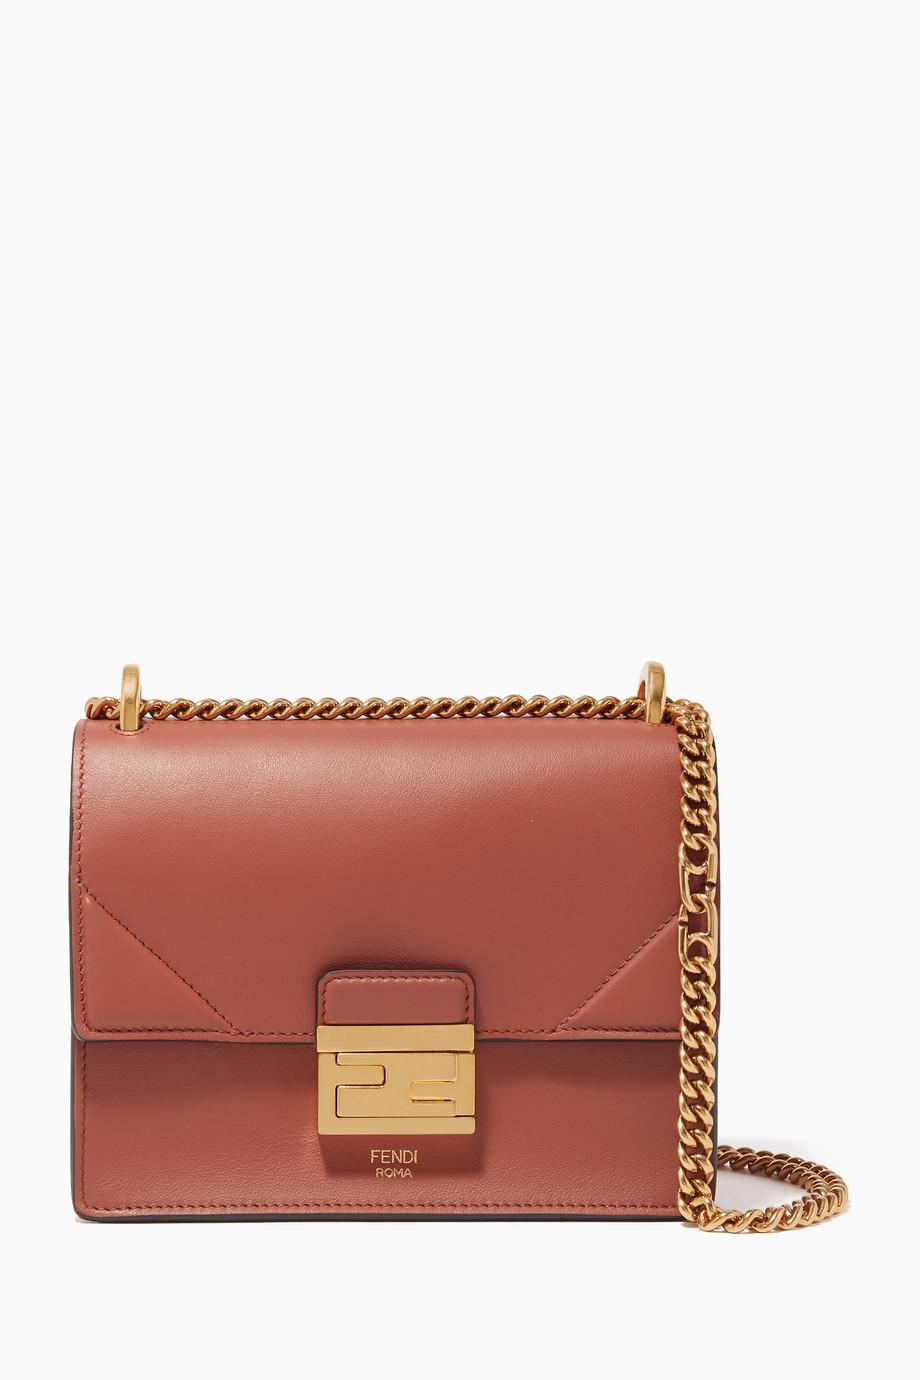 0227e87361 Shop Fendi Brown Kan U Small Leather Bag for Women | Ounass UAE